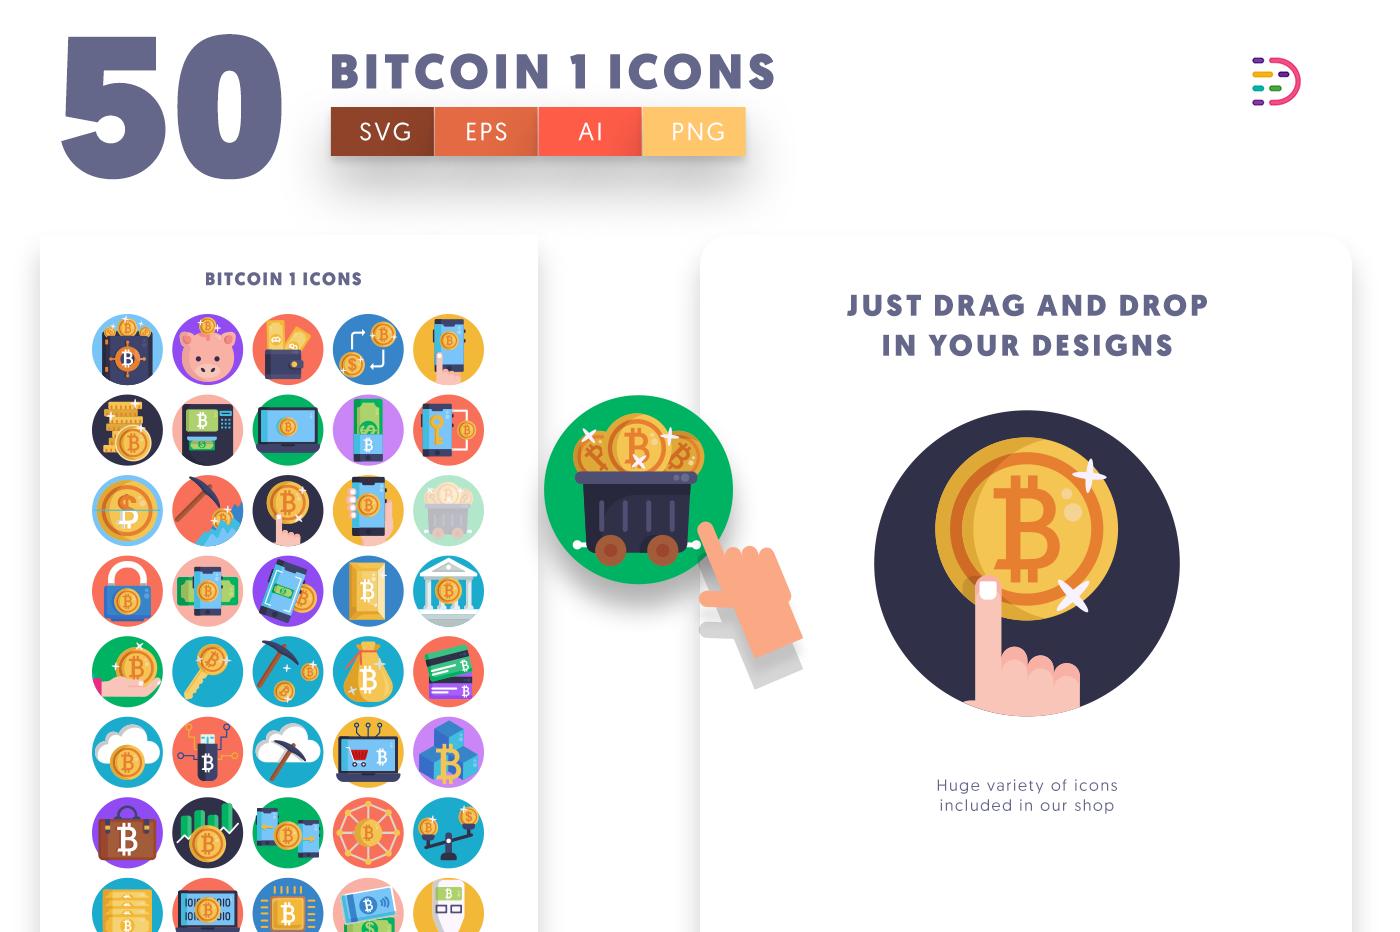 Drag and drop vector 50 Bitcoin 1 Icons